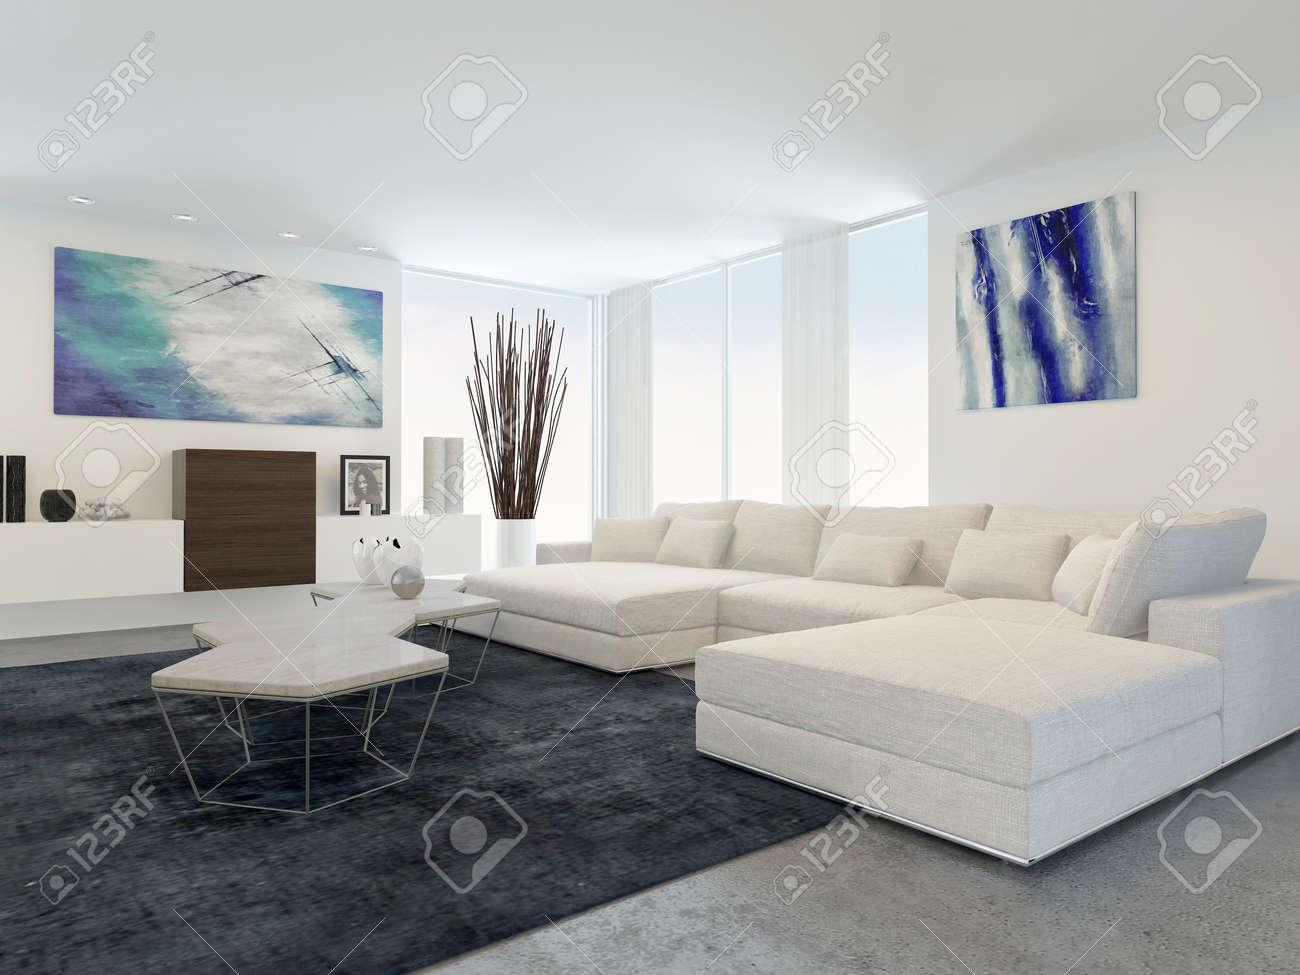 Modern White Furniture For Living Room Interior Of Modern Living Room With White Furniture Stock Photo